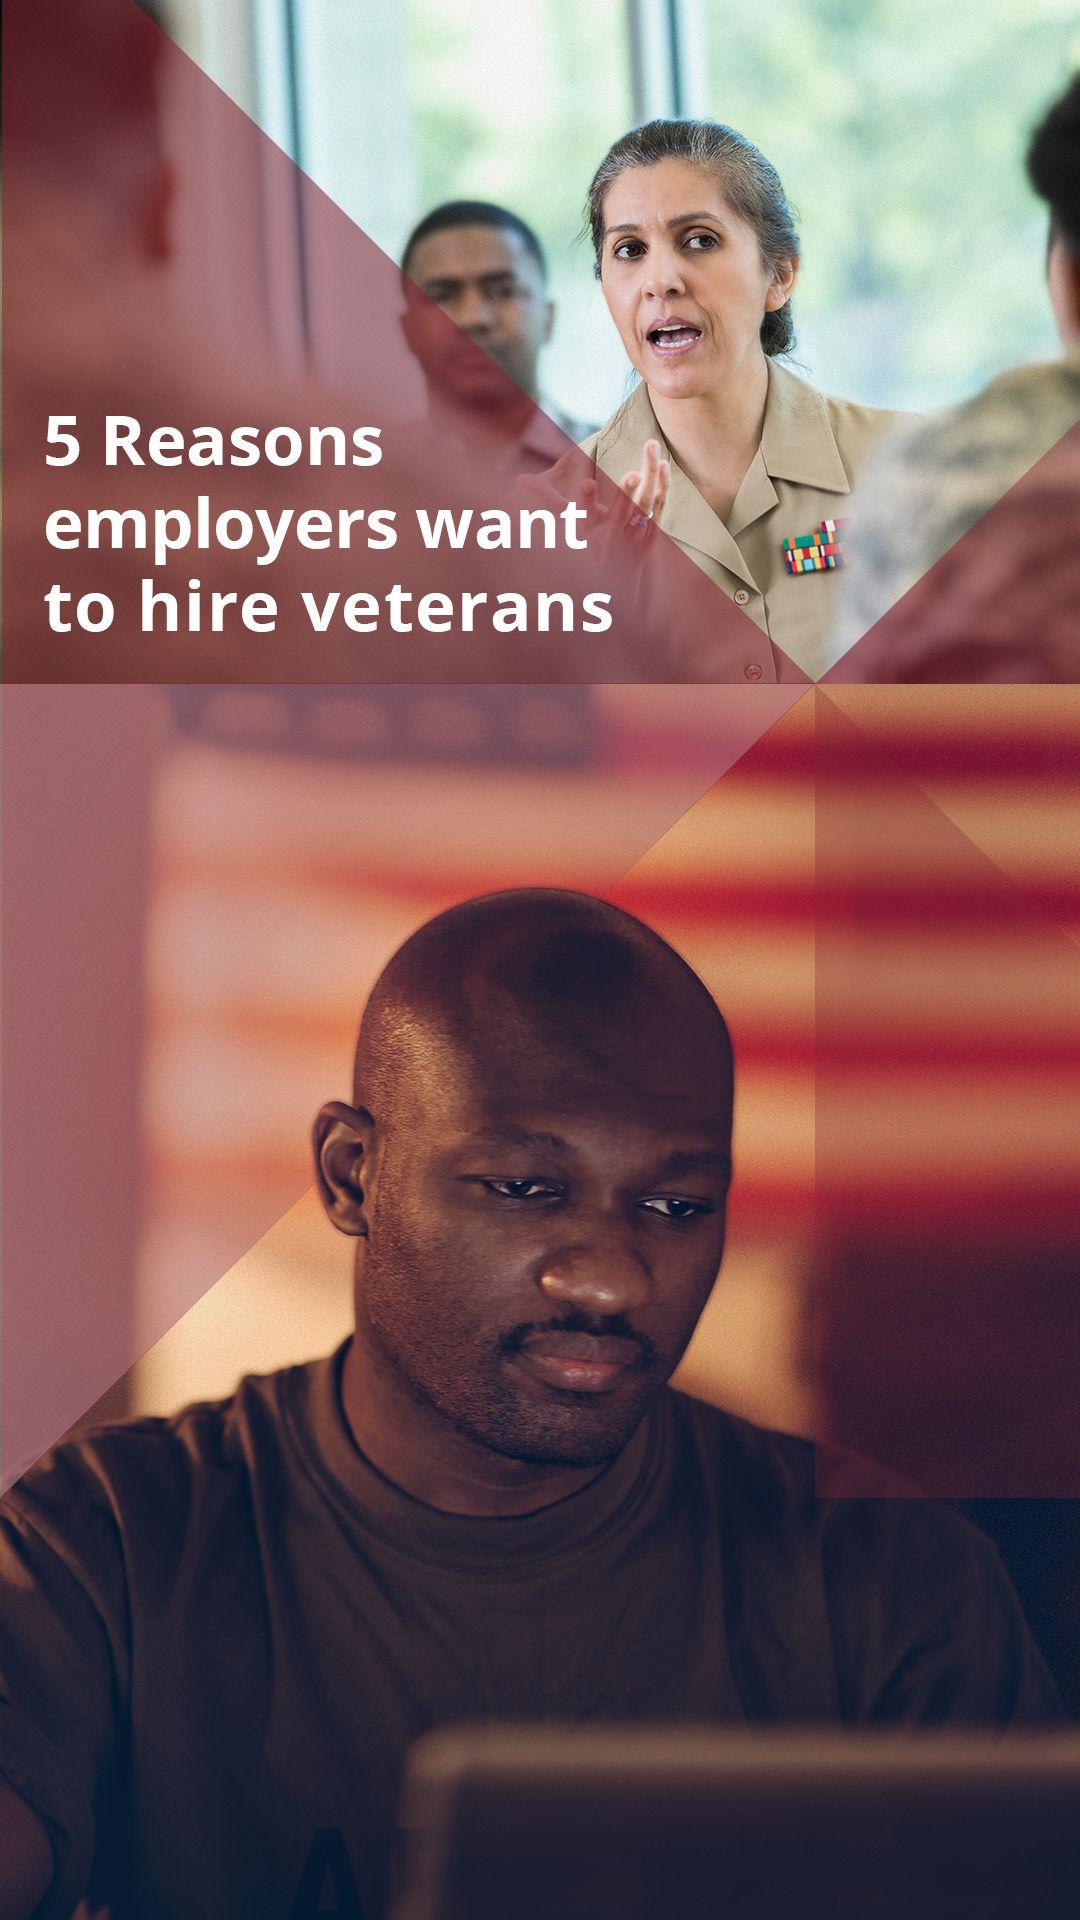 5 Reasons employers want to hire veterans Veteran jobs